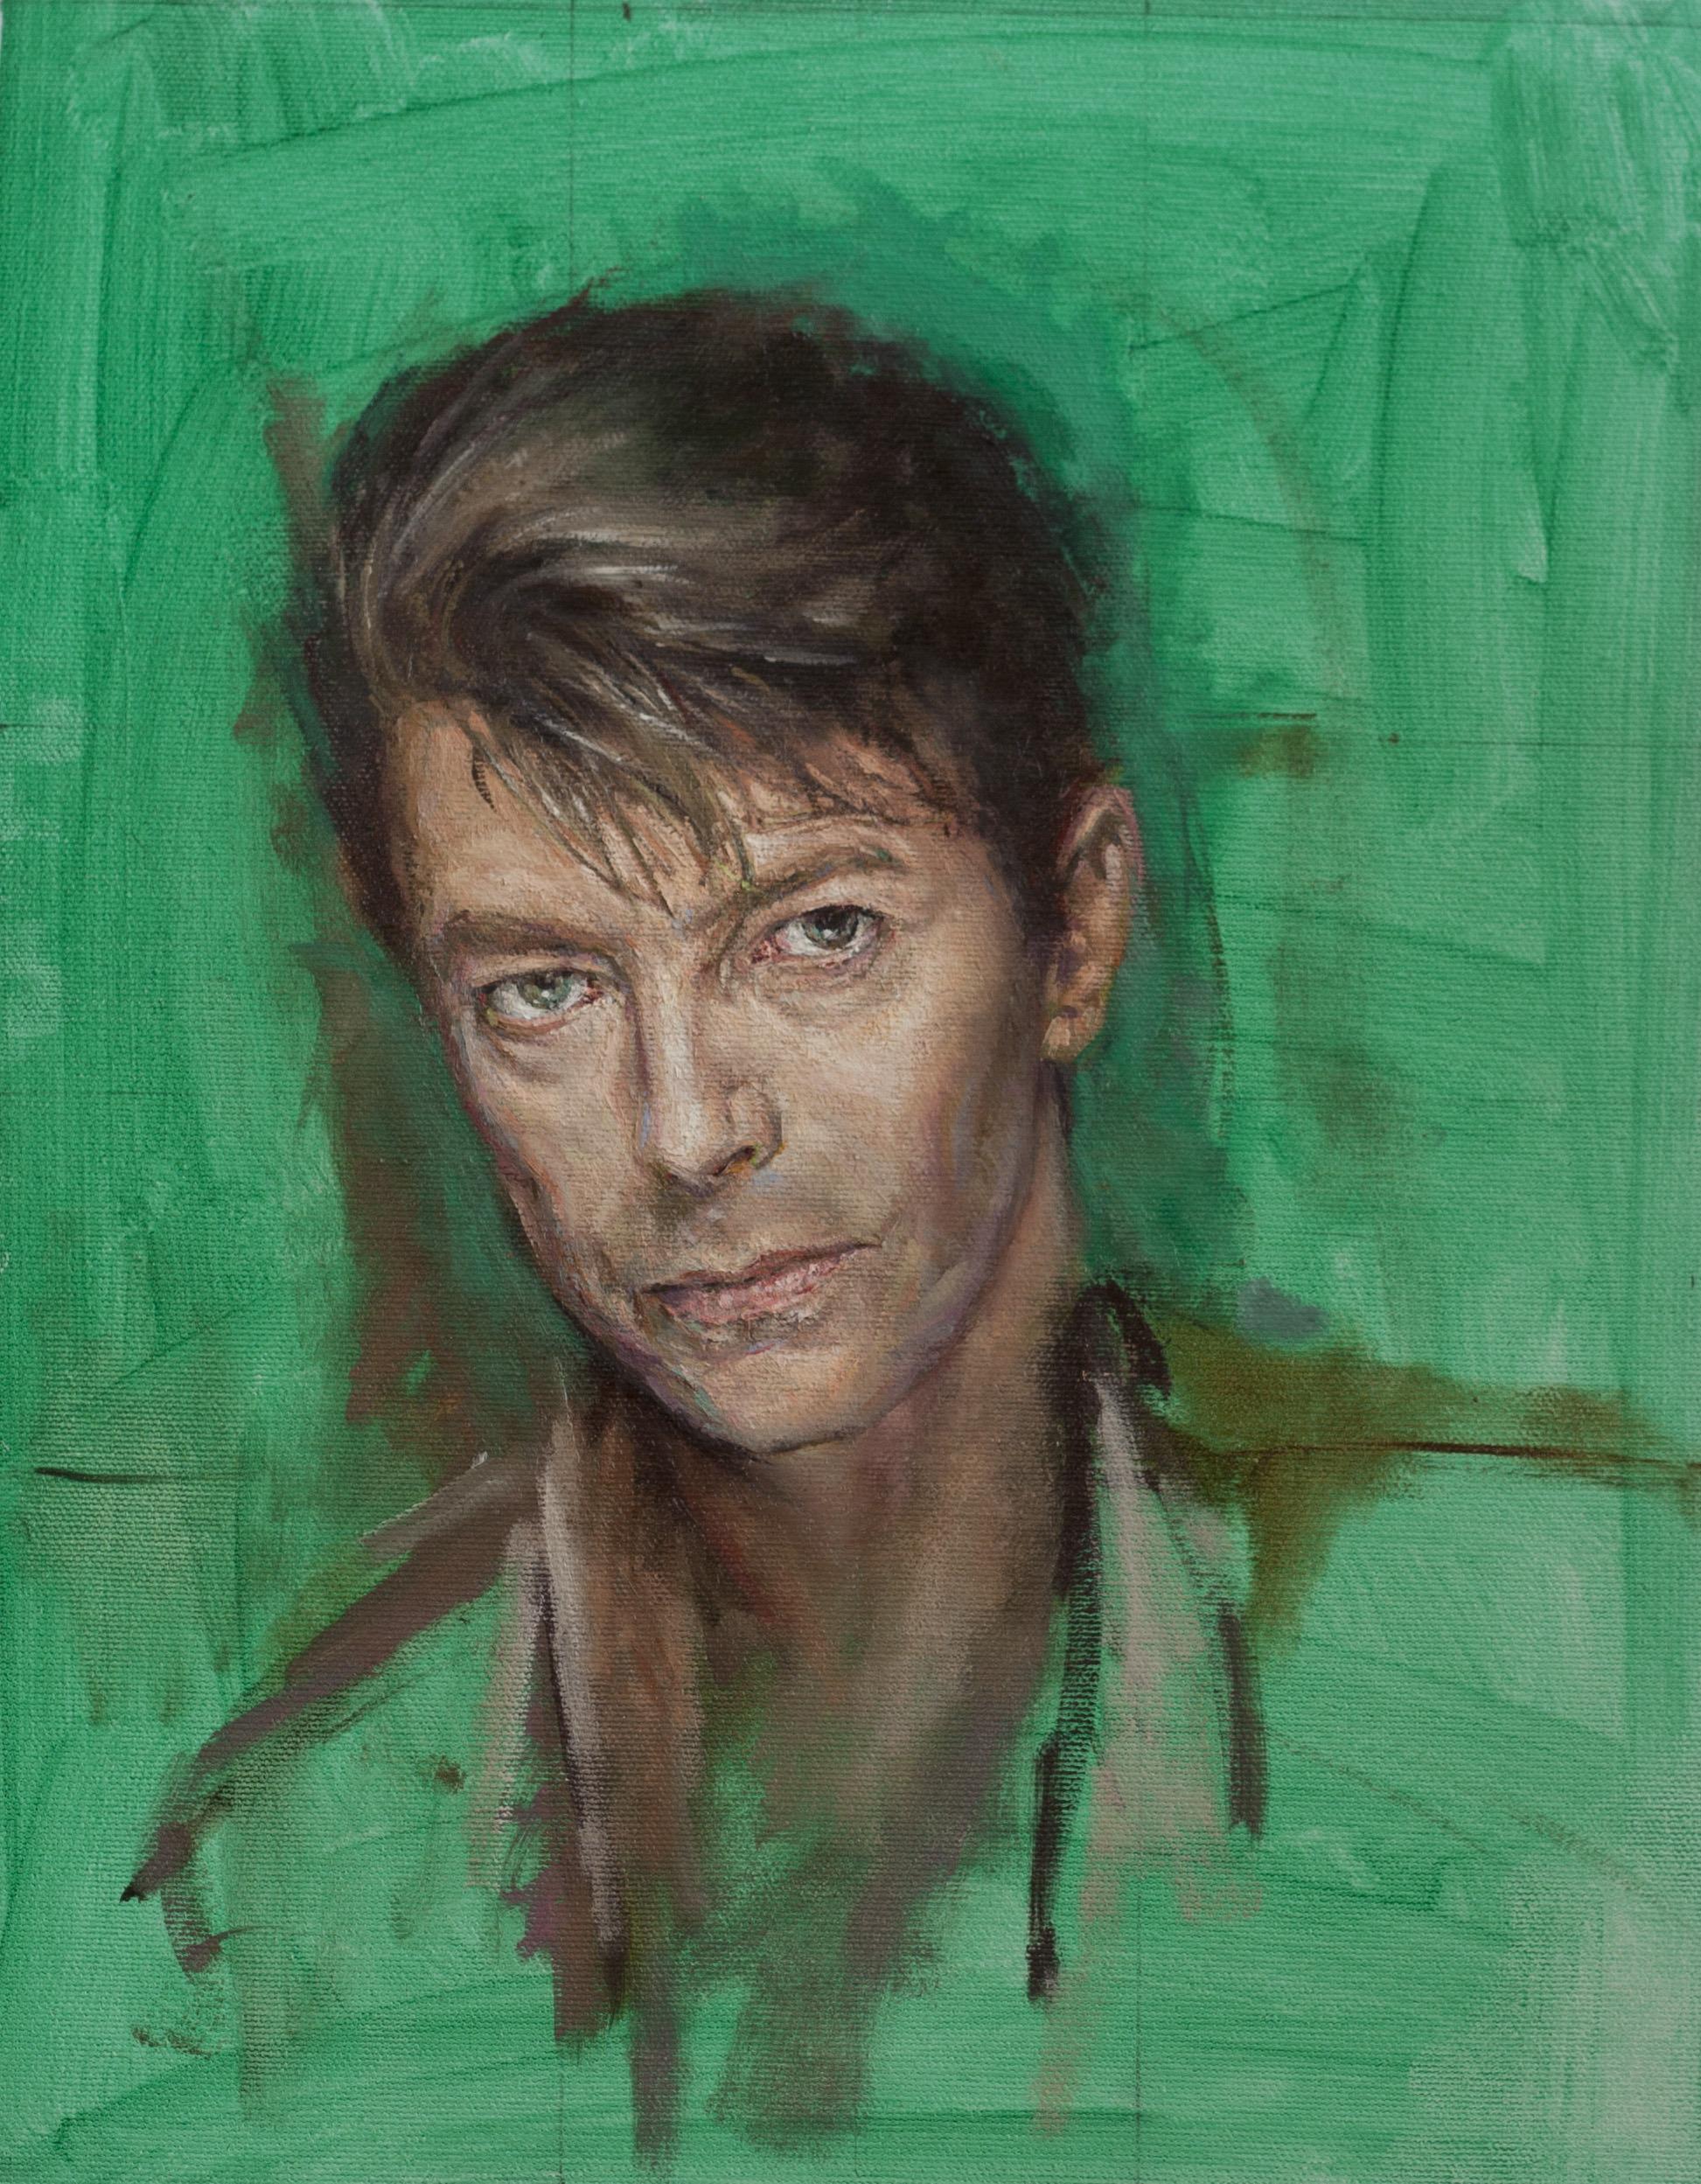 Bowie - David Zeggert, Faculty, SUNY Broome CC